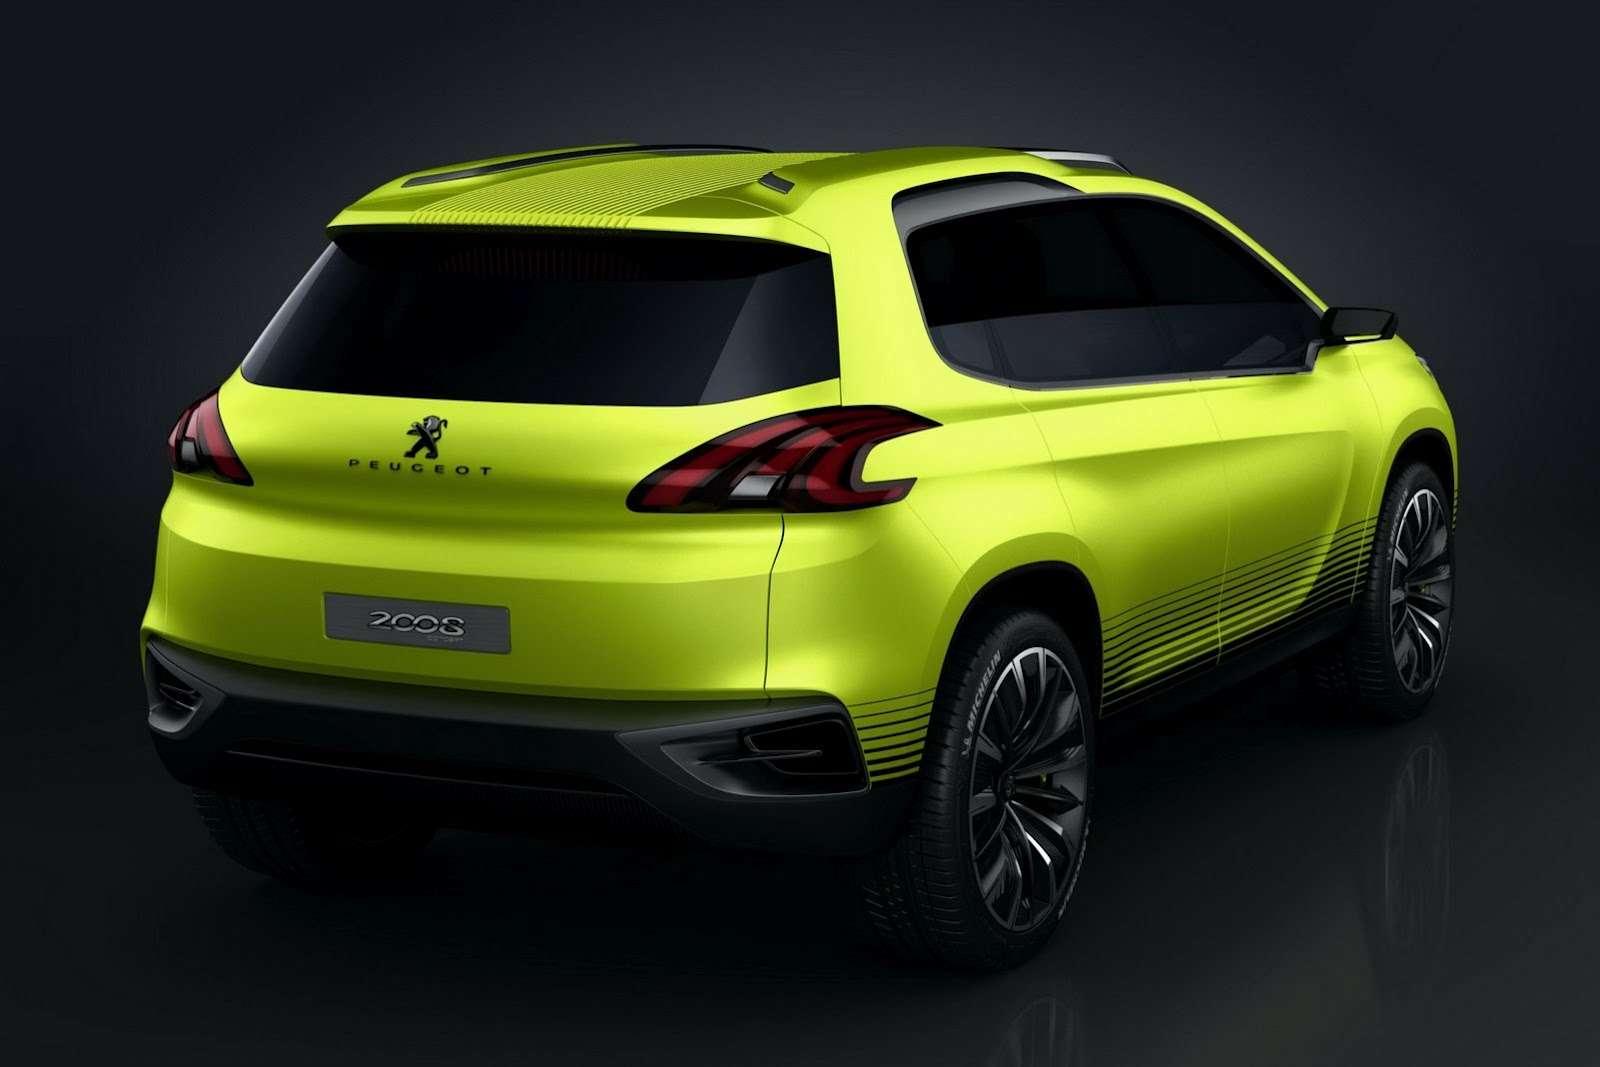 _no_copyright_Peugeot-2008-Concept-1